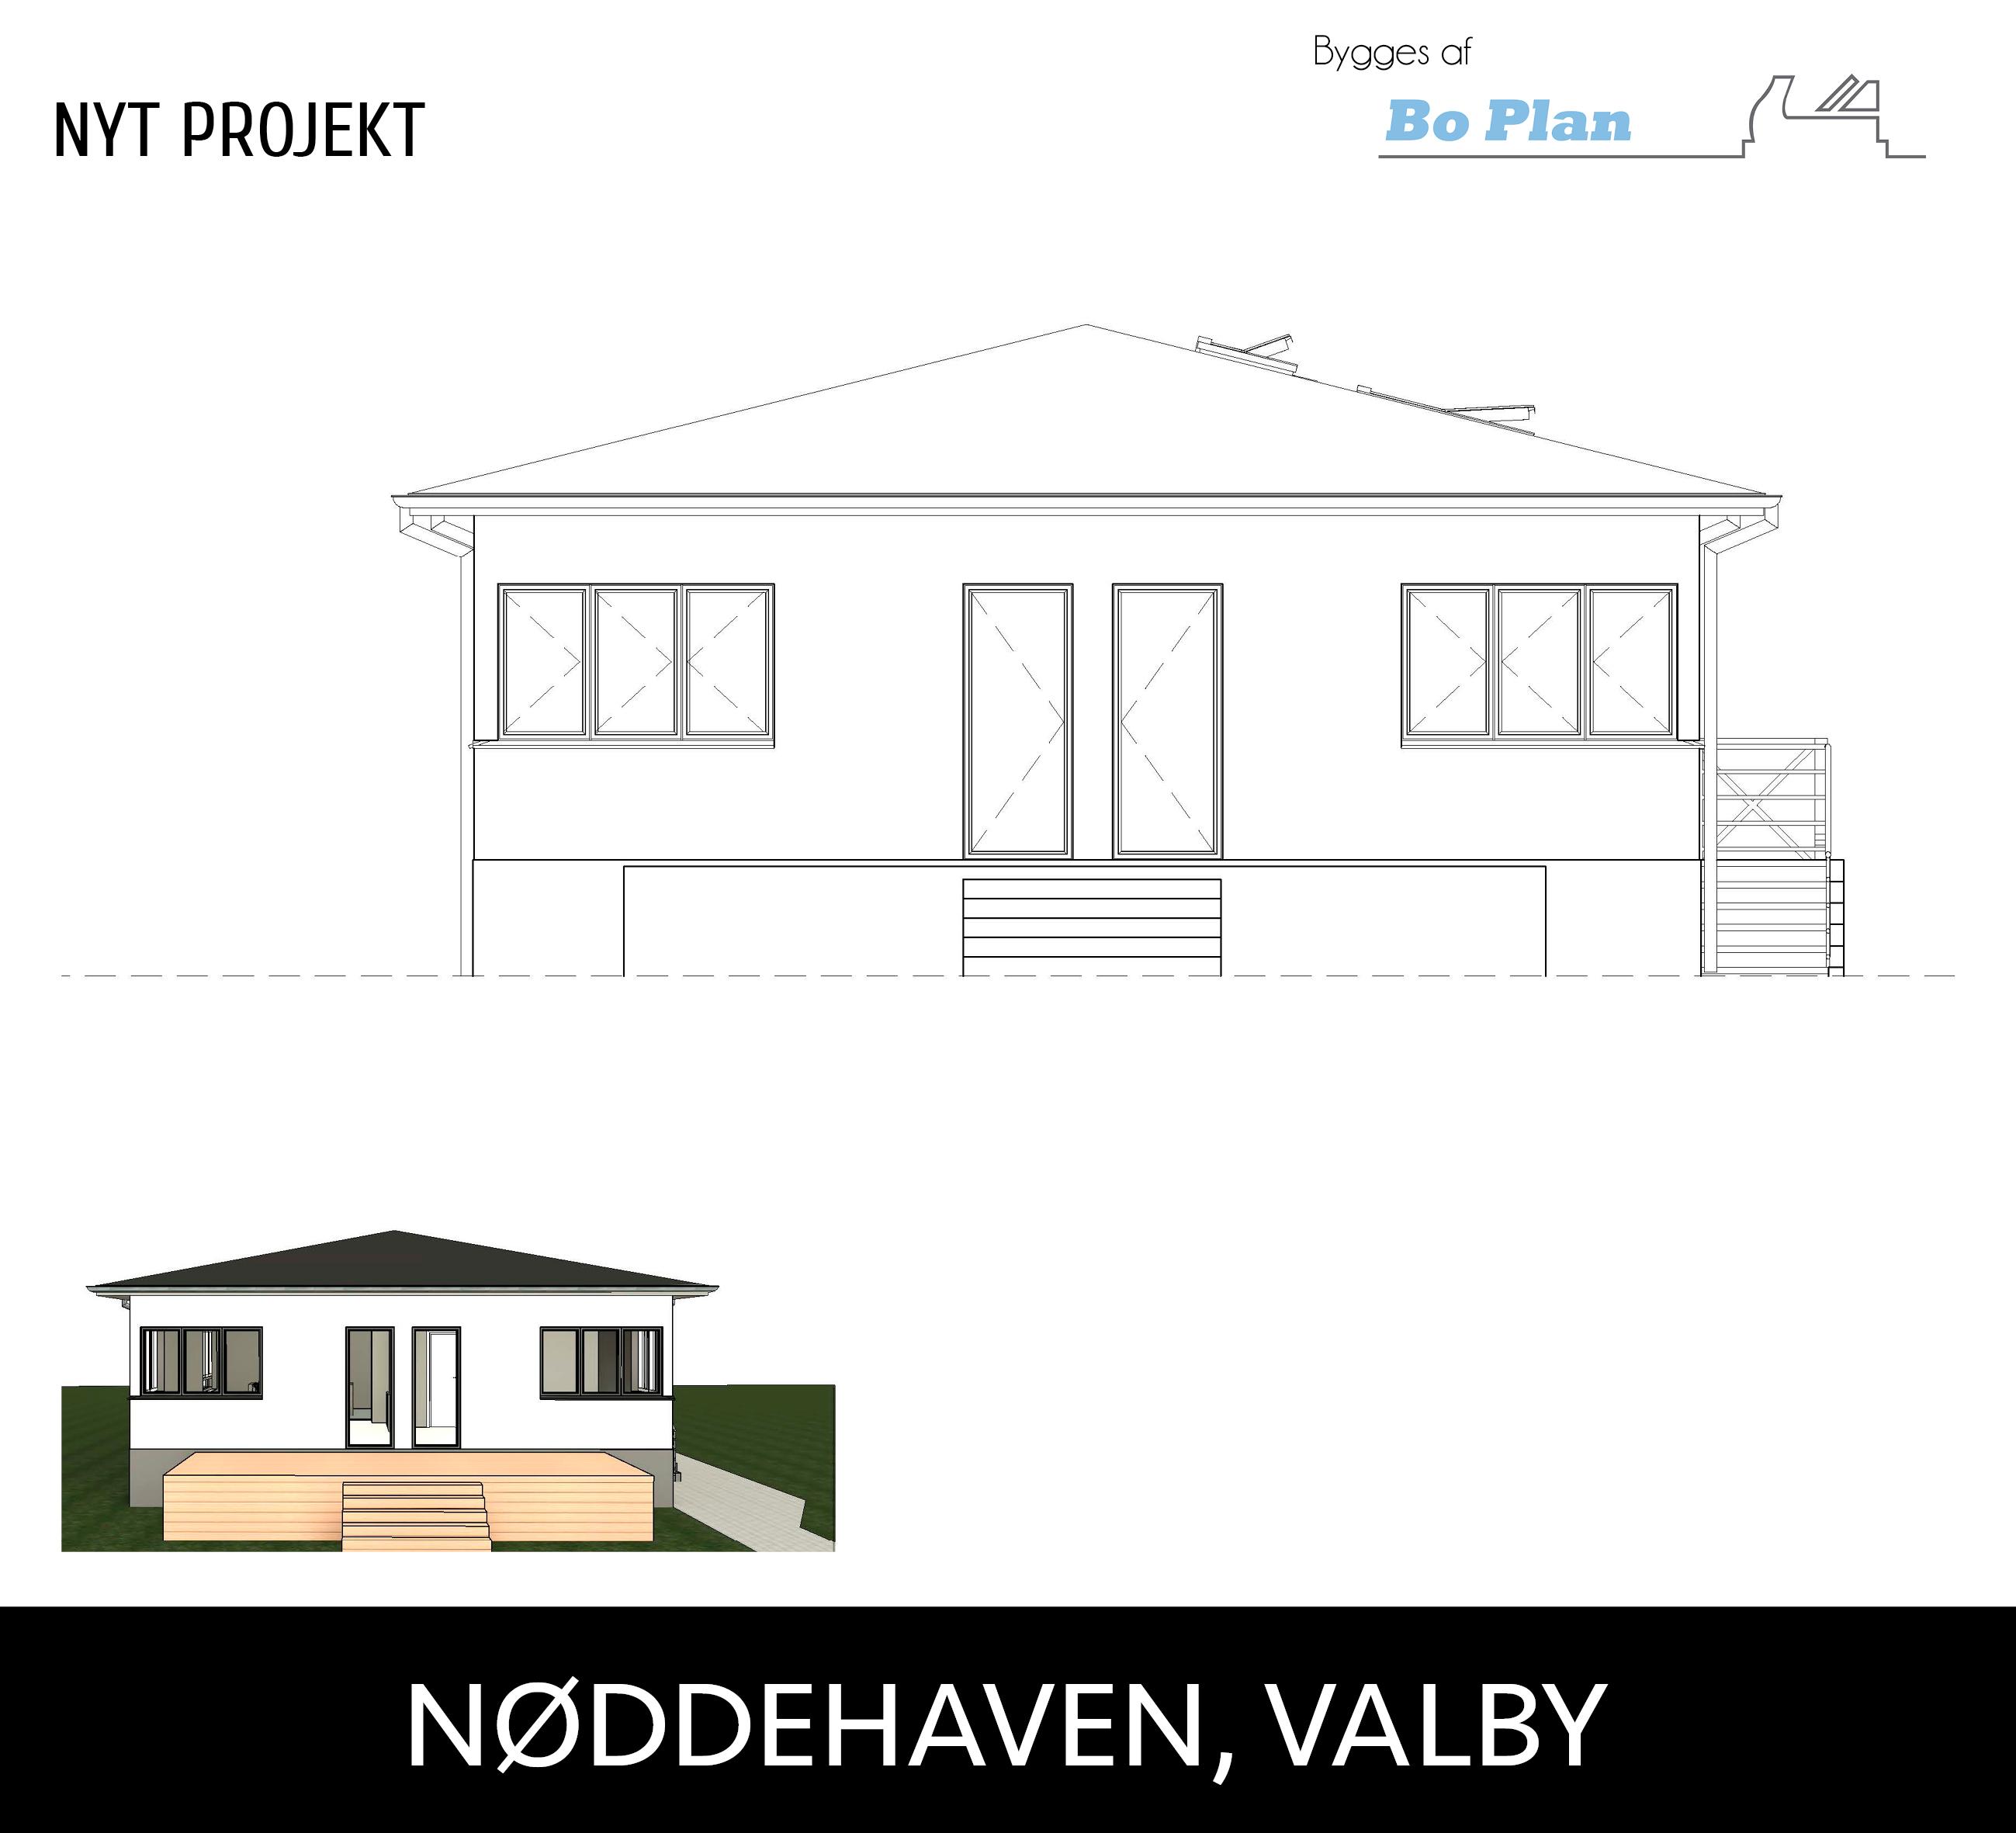 Nøddehaven, Valby5